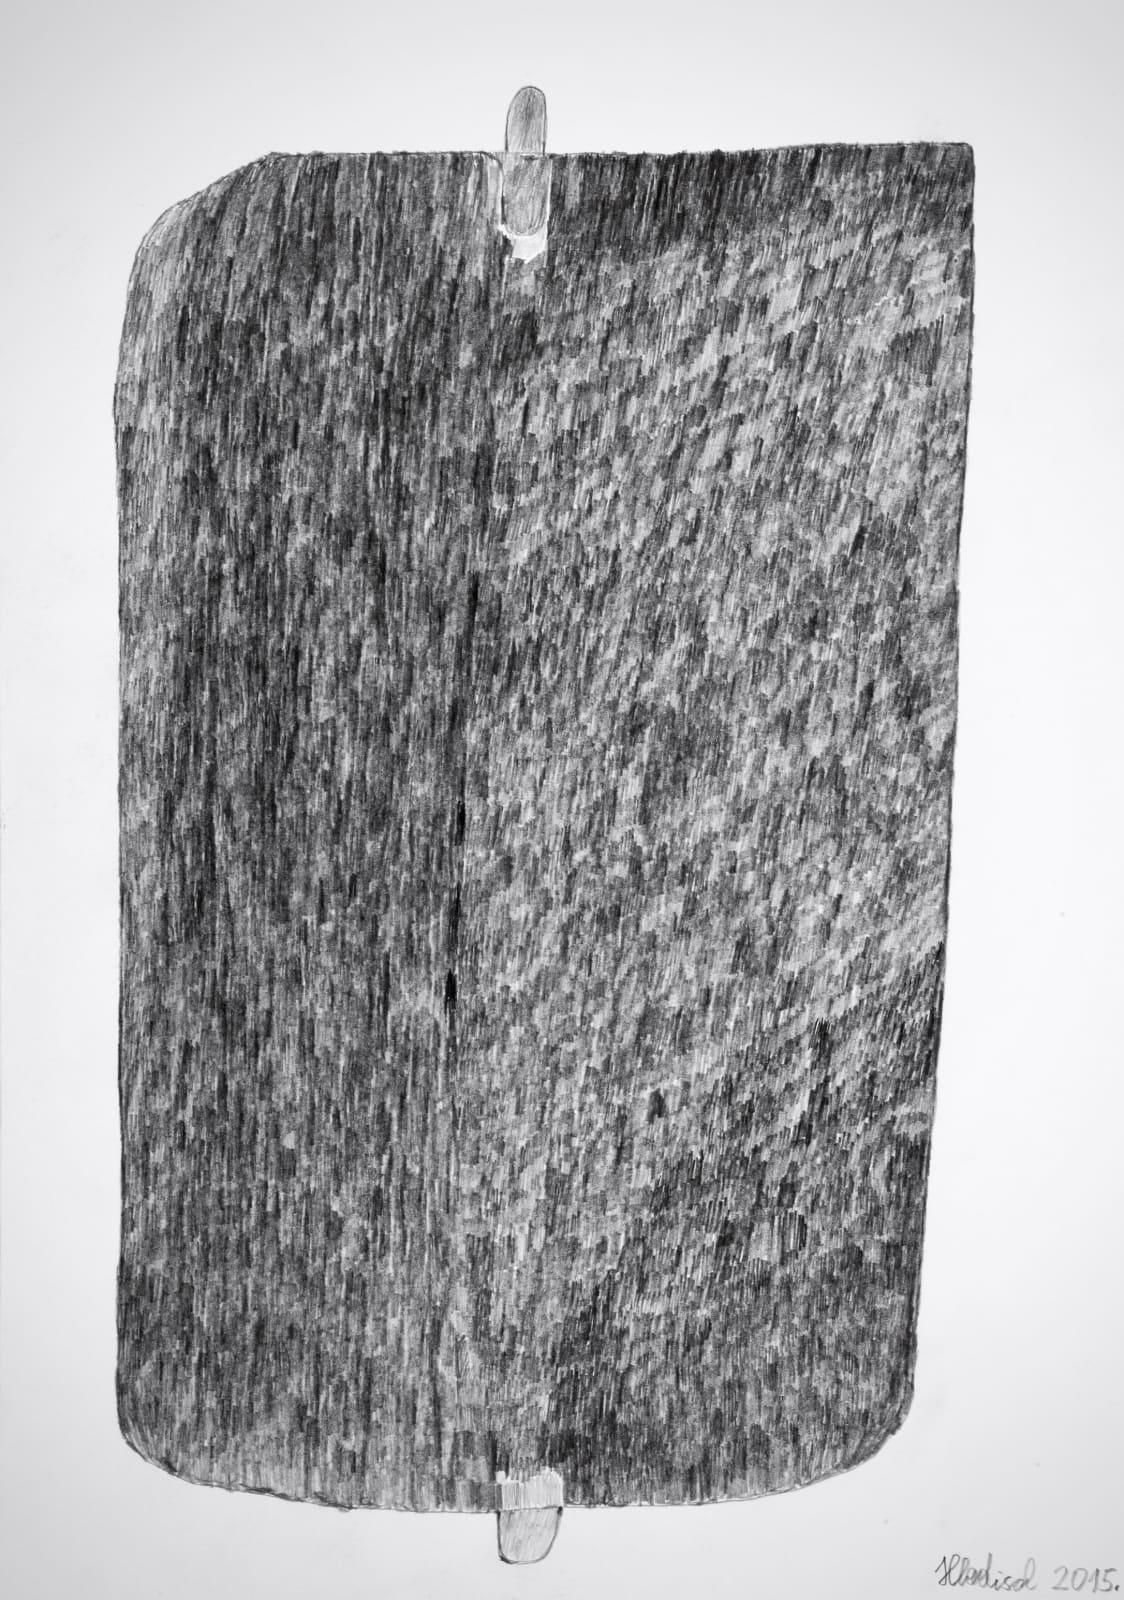 Thermophore, 2015 Graphite on paper 16.5 x 11.7 in. (42 x 29.7 cm.) (HH 16) $4,000